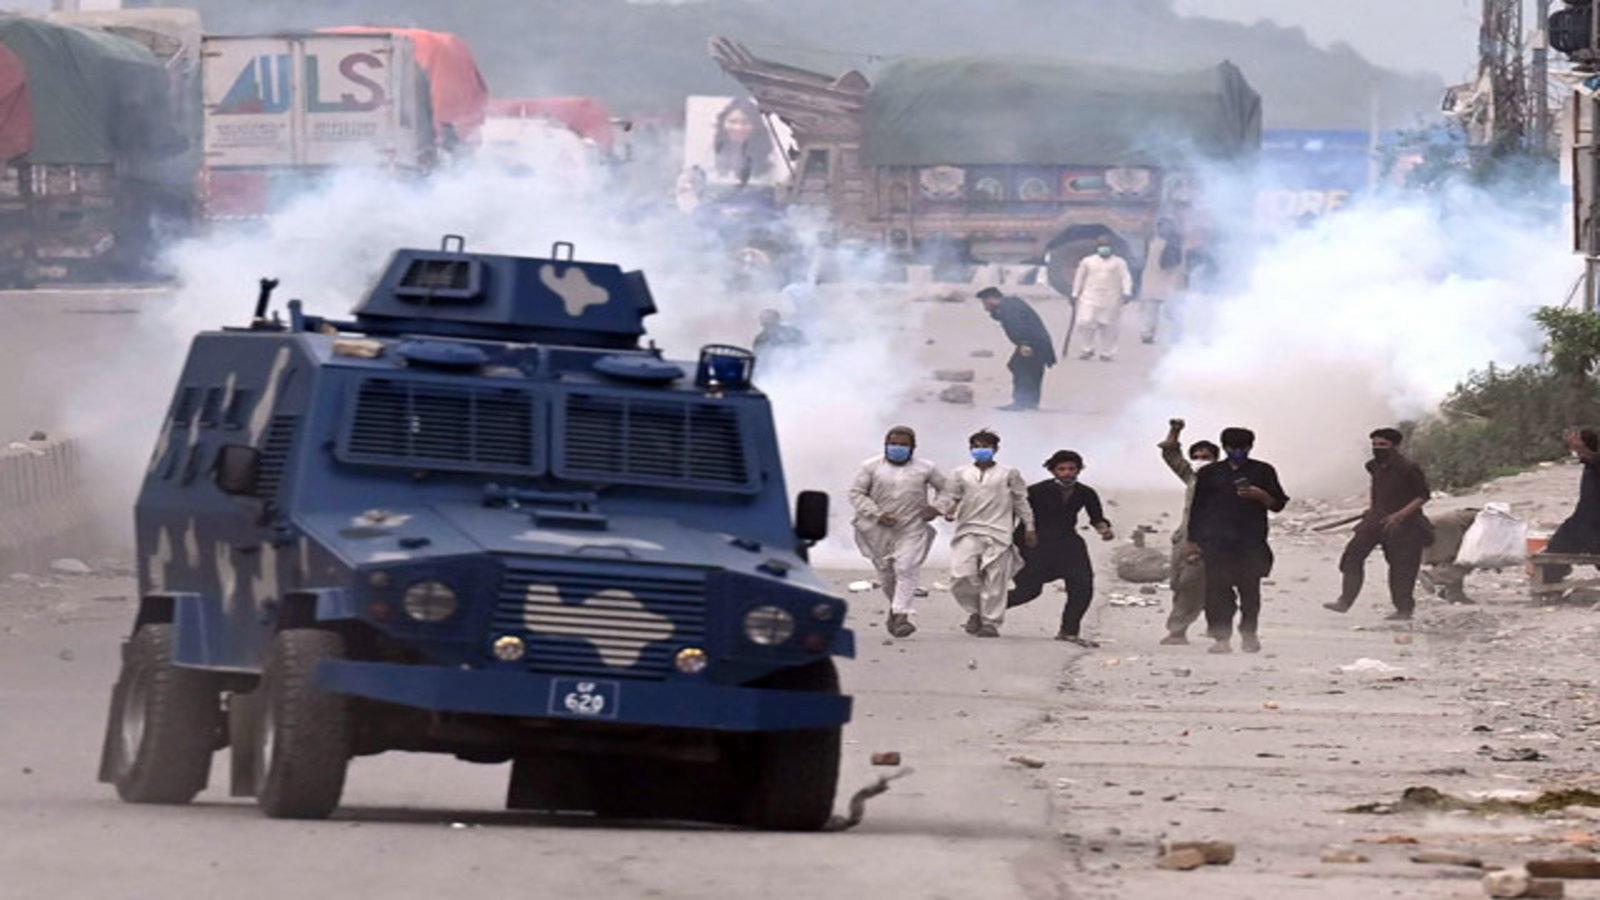 Violent protest of supporters, Pakistan to ban Tehreek-e-Labbaik Pakistan (TLP)